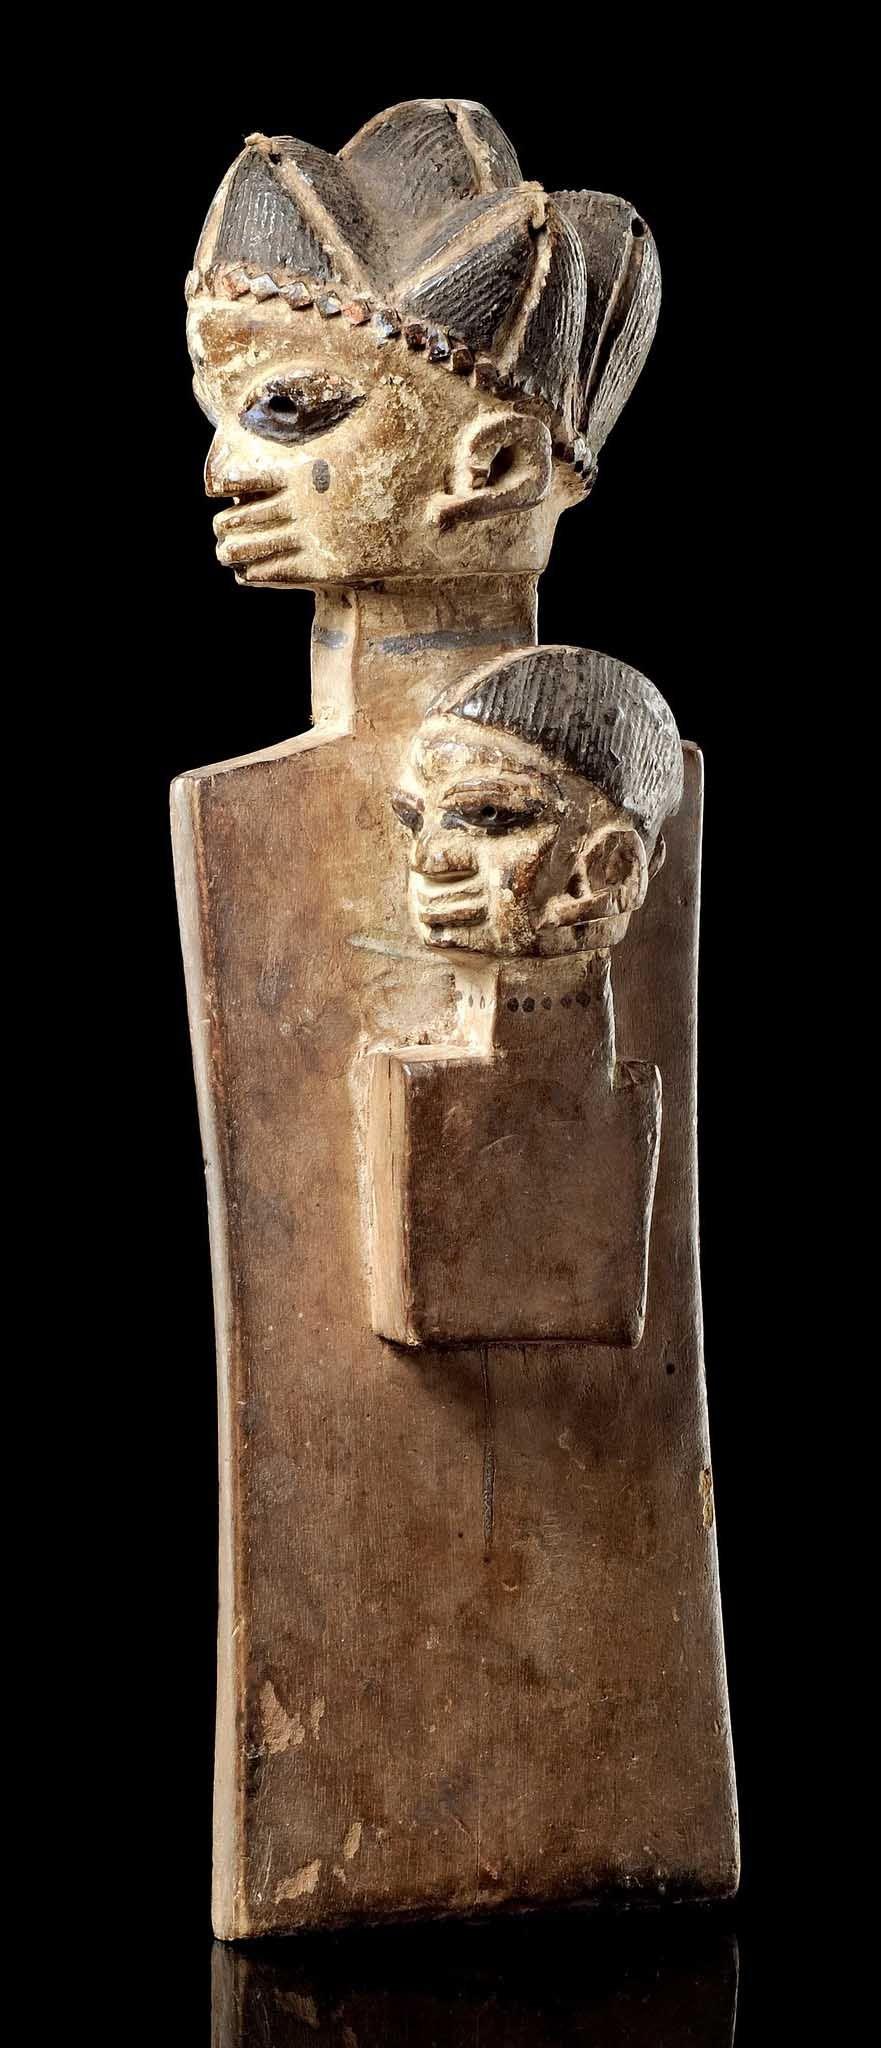 Africa Slat doll from the Yoruba people of Nigeria Wood black